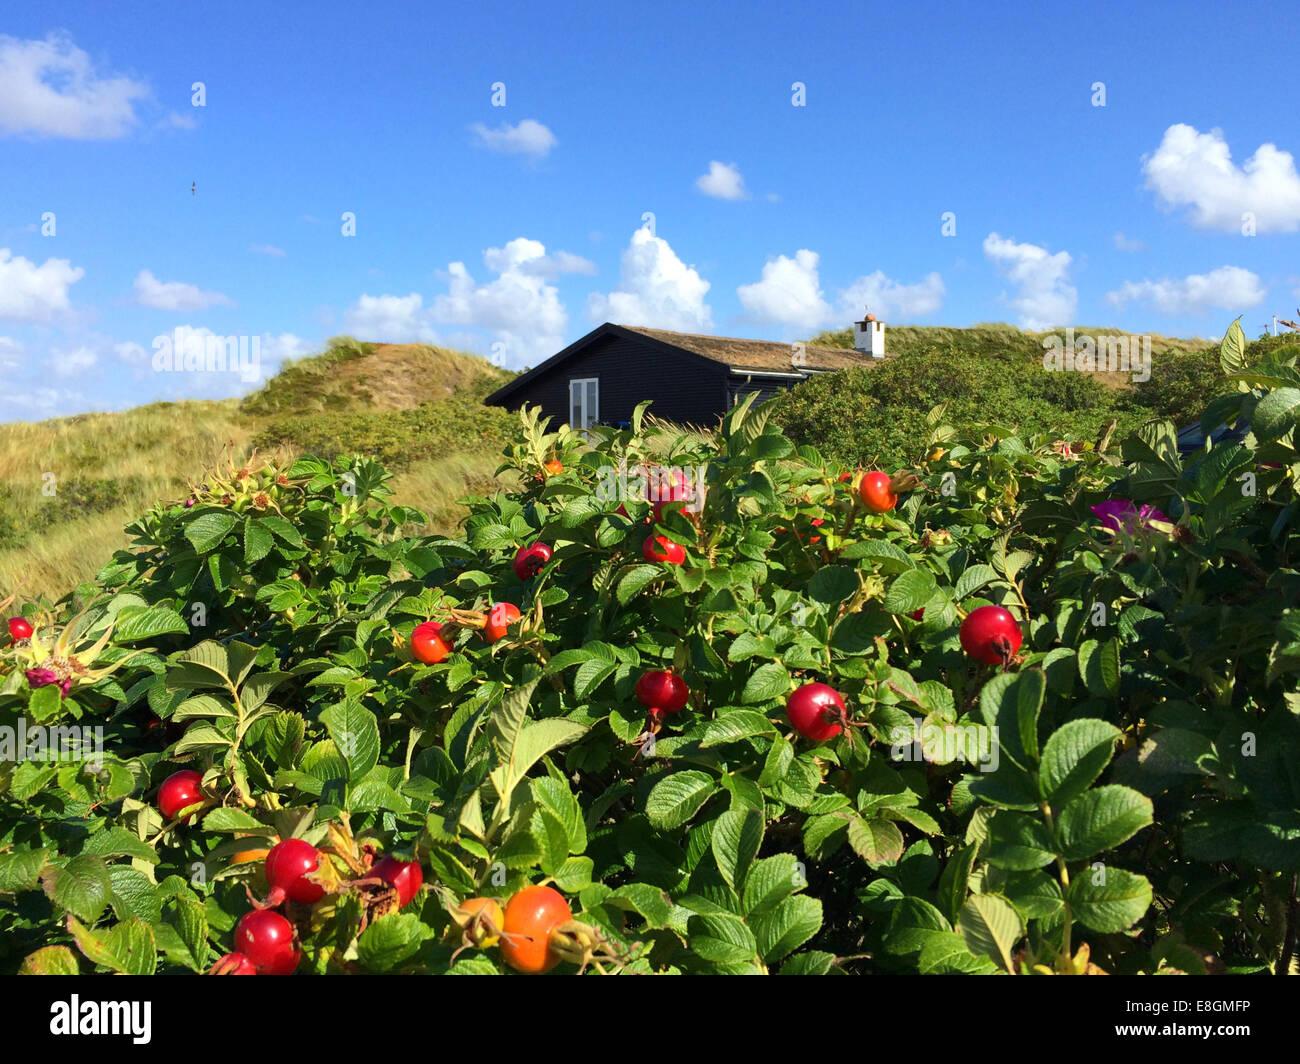 Summerhouse with rosehip bushes in foreground, Fanoe Bad, Fanoe, Jutland, Denmark Stock Photo